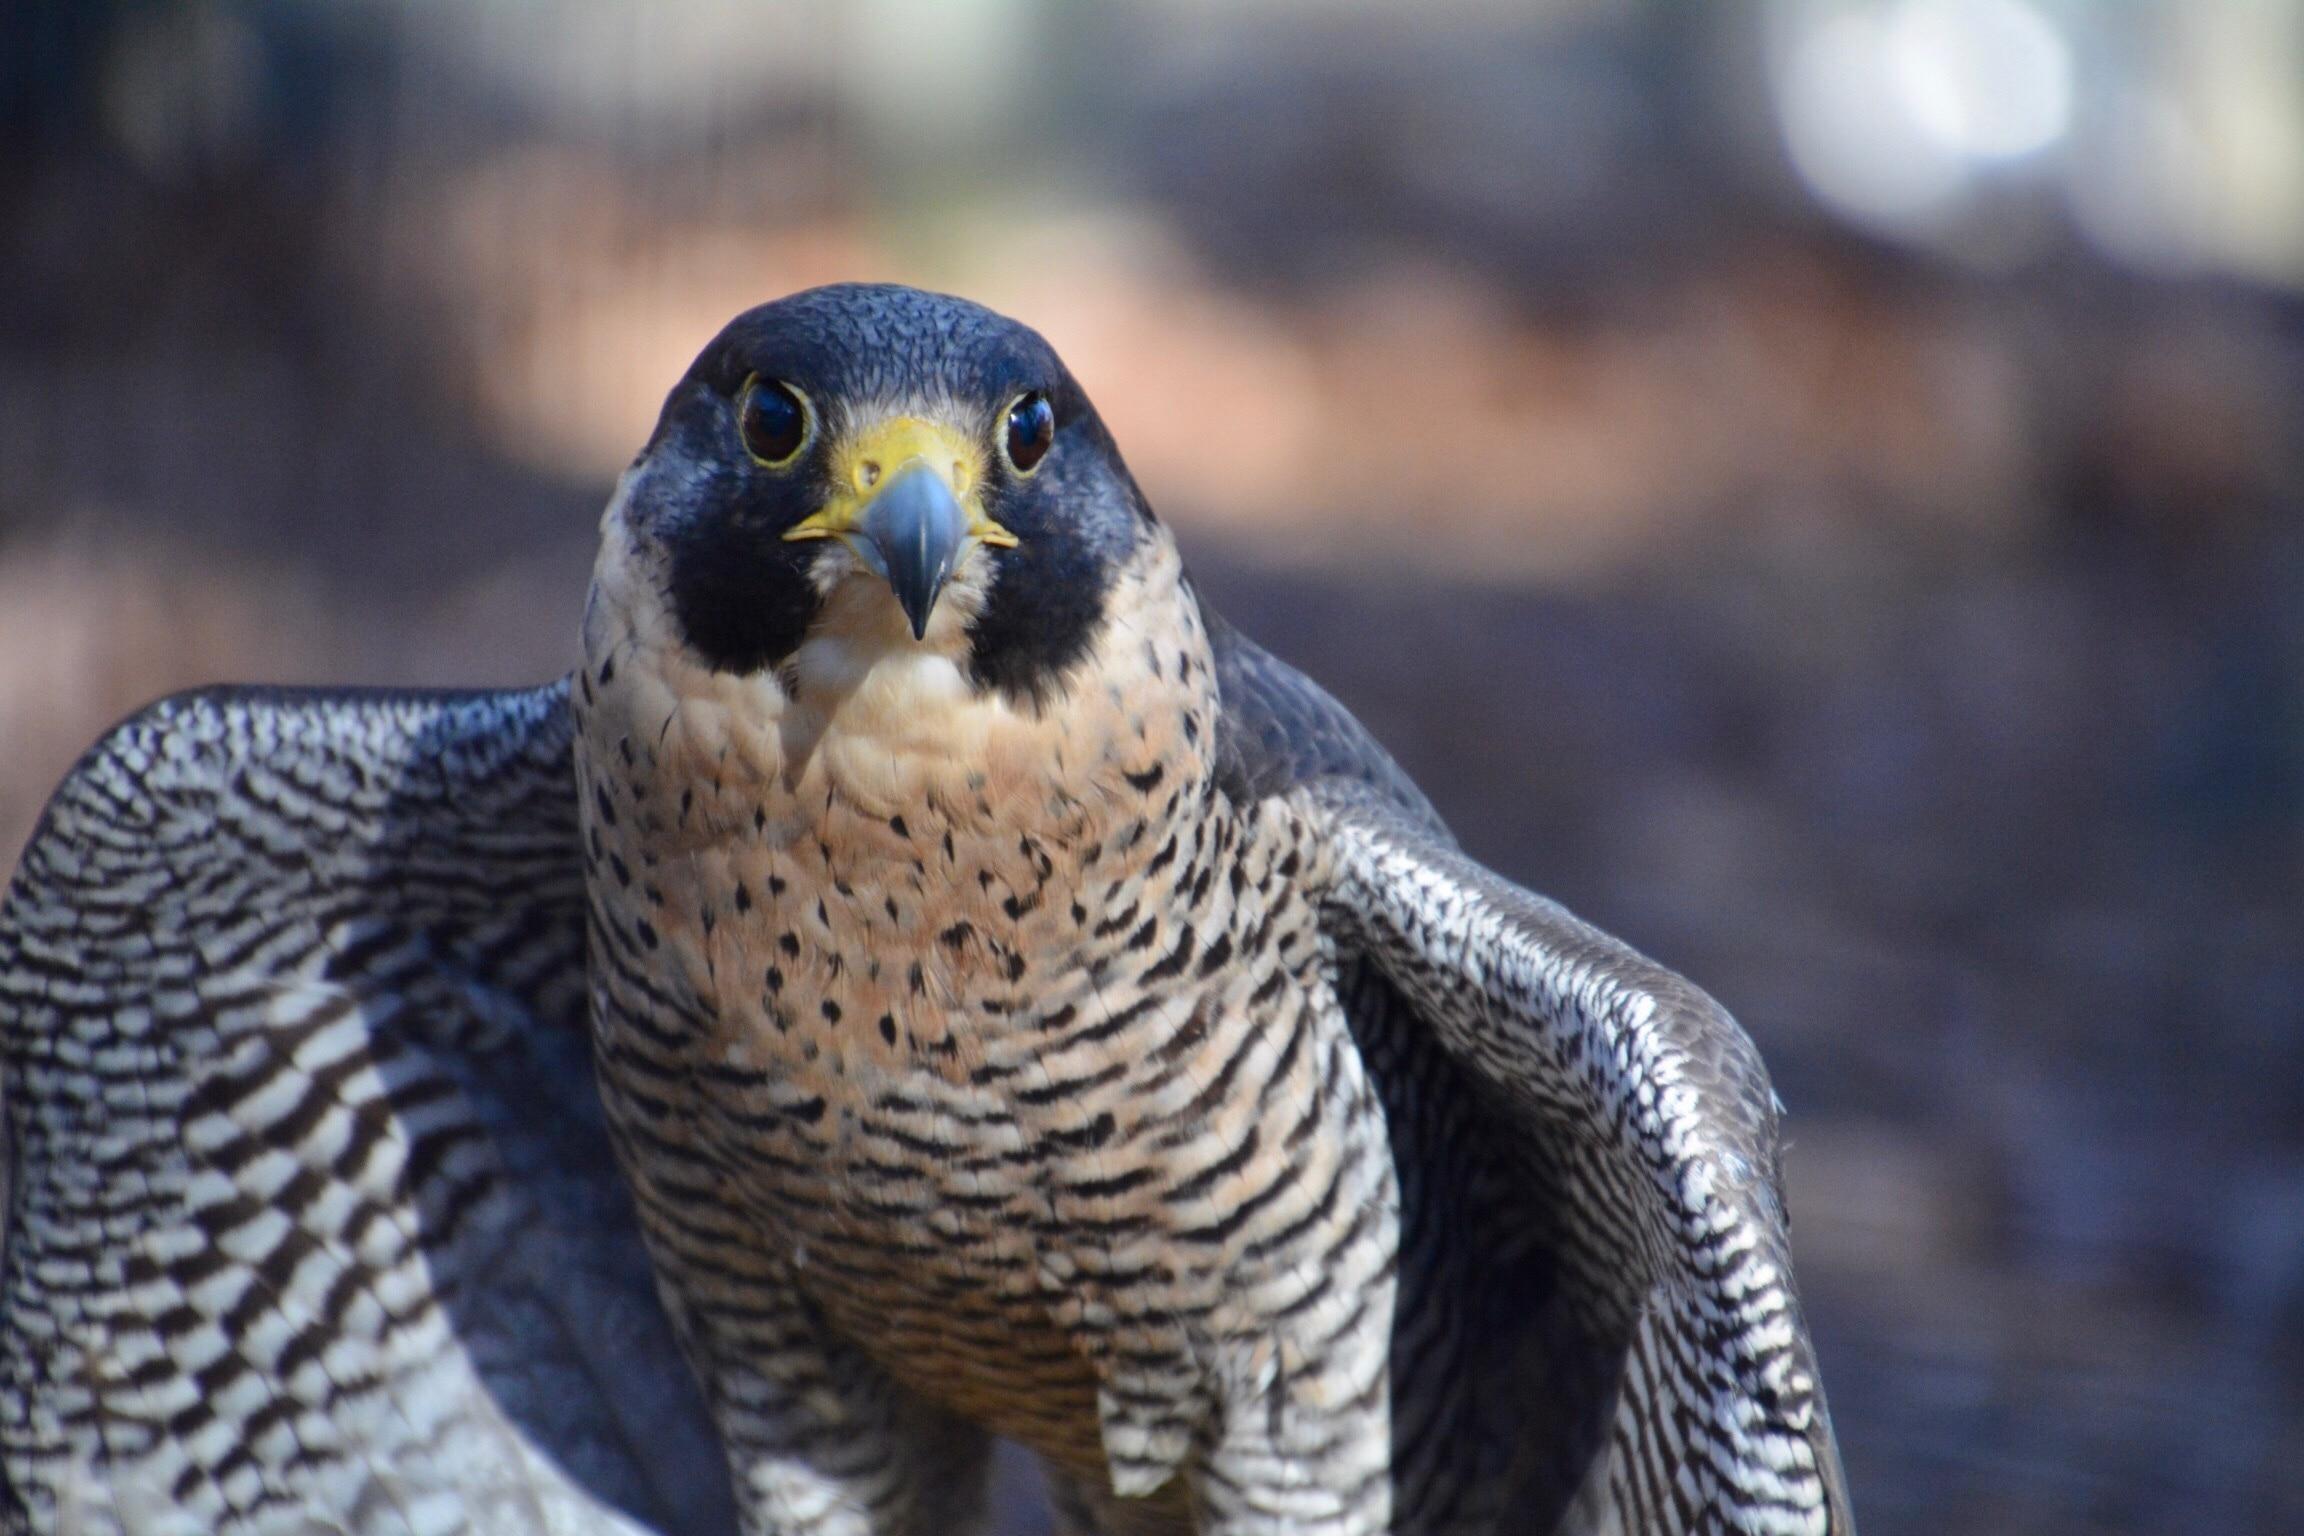 World Bird Sanctuary, Valley Park, Missouri, United States of America